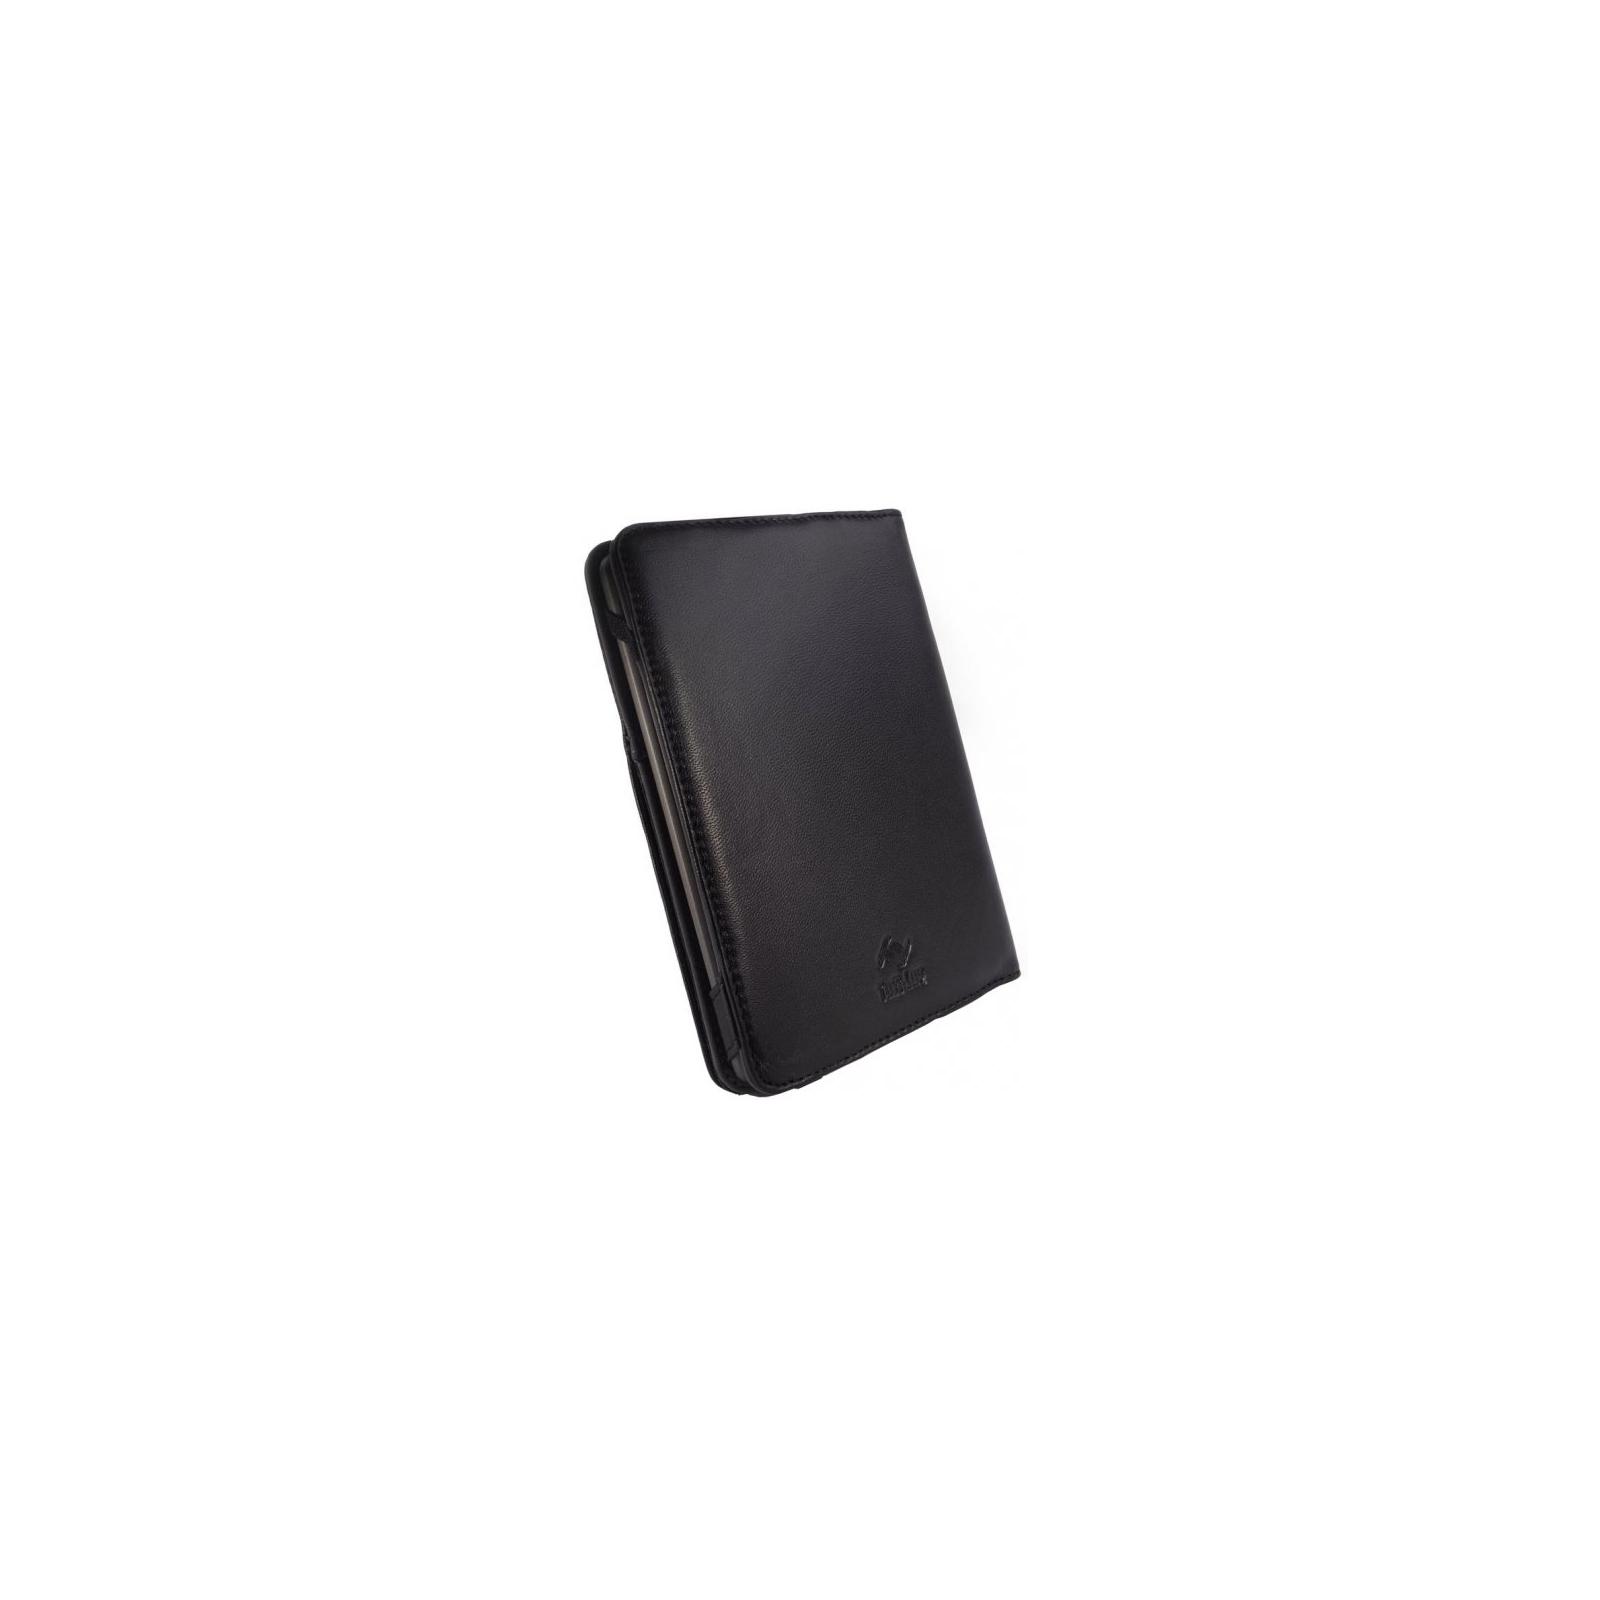 Чехол для электронной книги Tuff-Luv 6 Embrace Plus Leather Napa Black (A10_40)